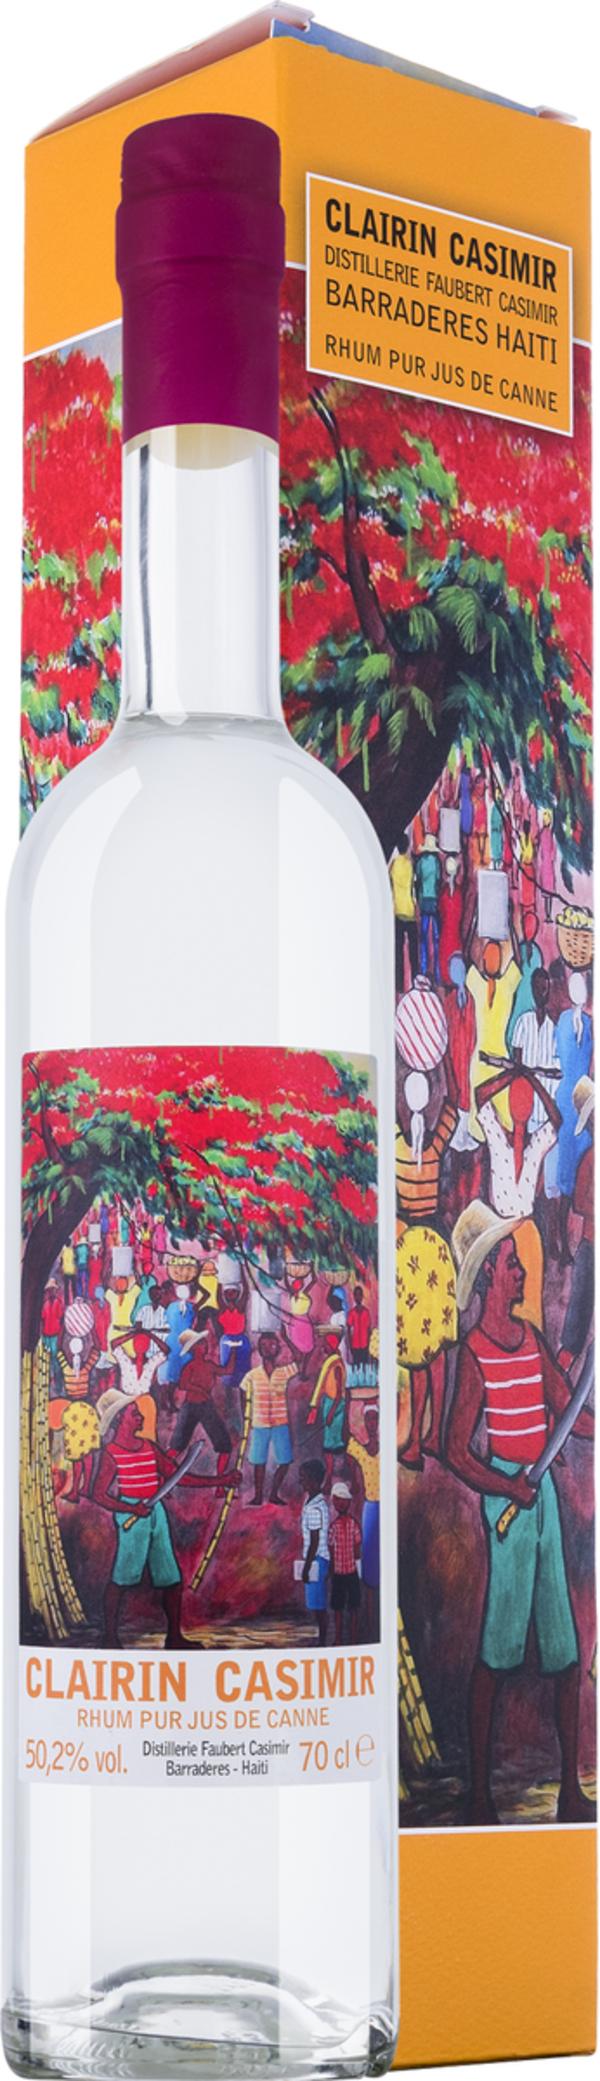 Clairin Casimir Rum in Gp   - Rum - Velier, Haiti, trocken, 0,7l